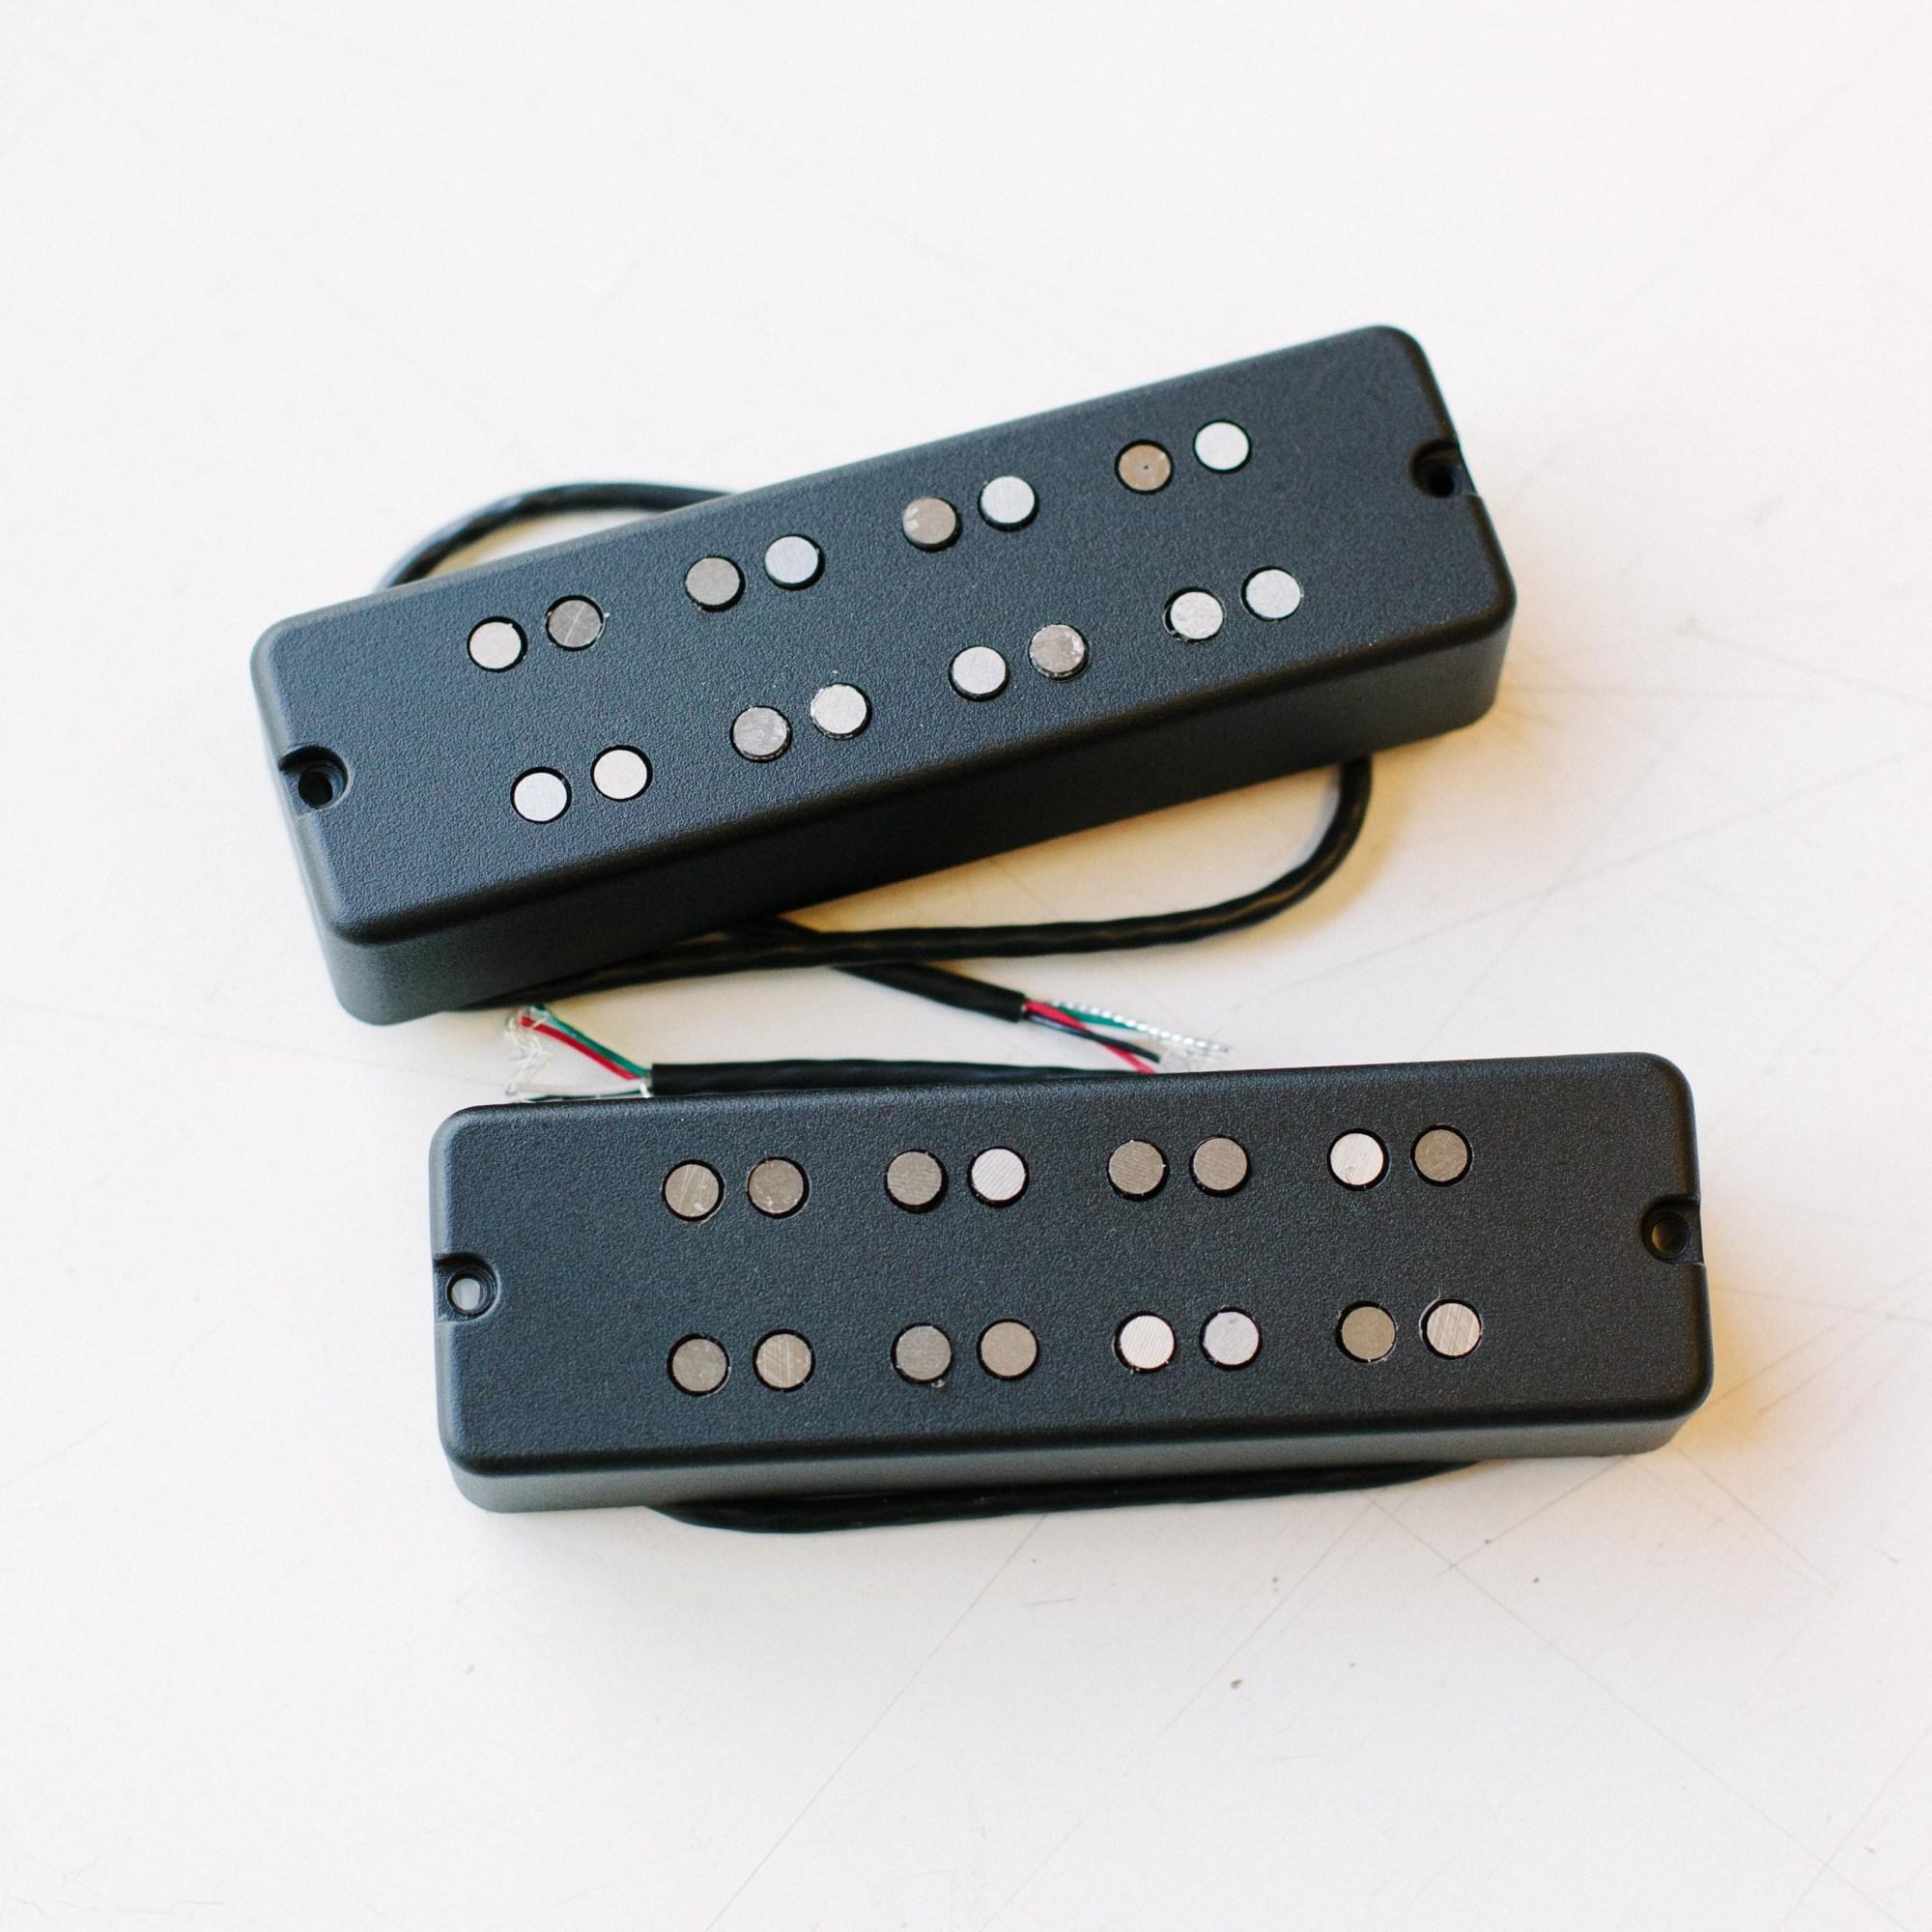 hight resolution of bass guitar pickups custom bass guitar custom guitar shop fodera guitars